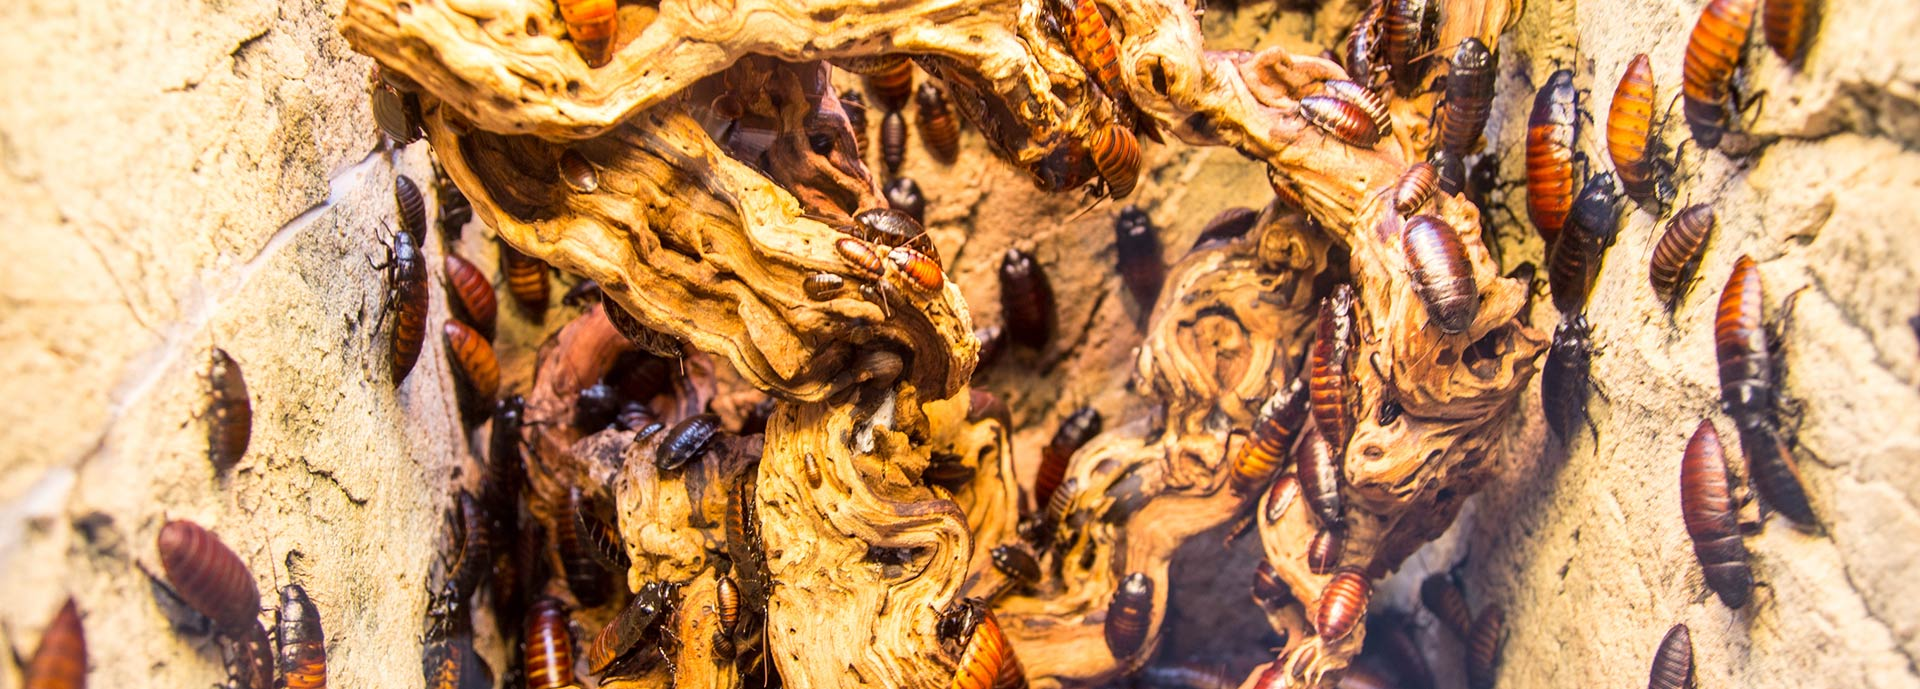 Schabe- & Kakerlakenbekämpfung